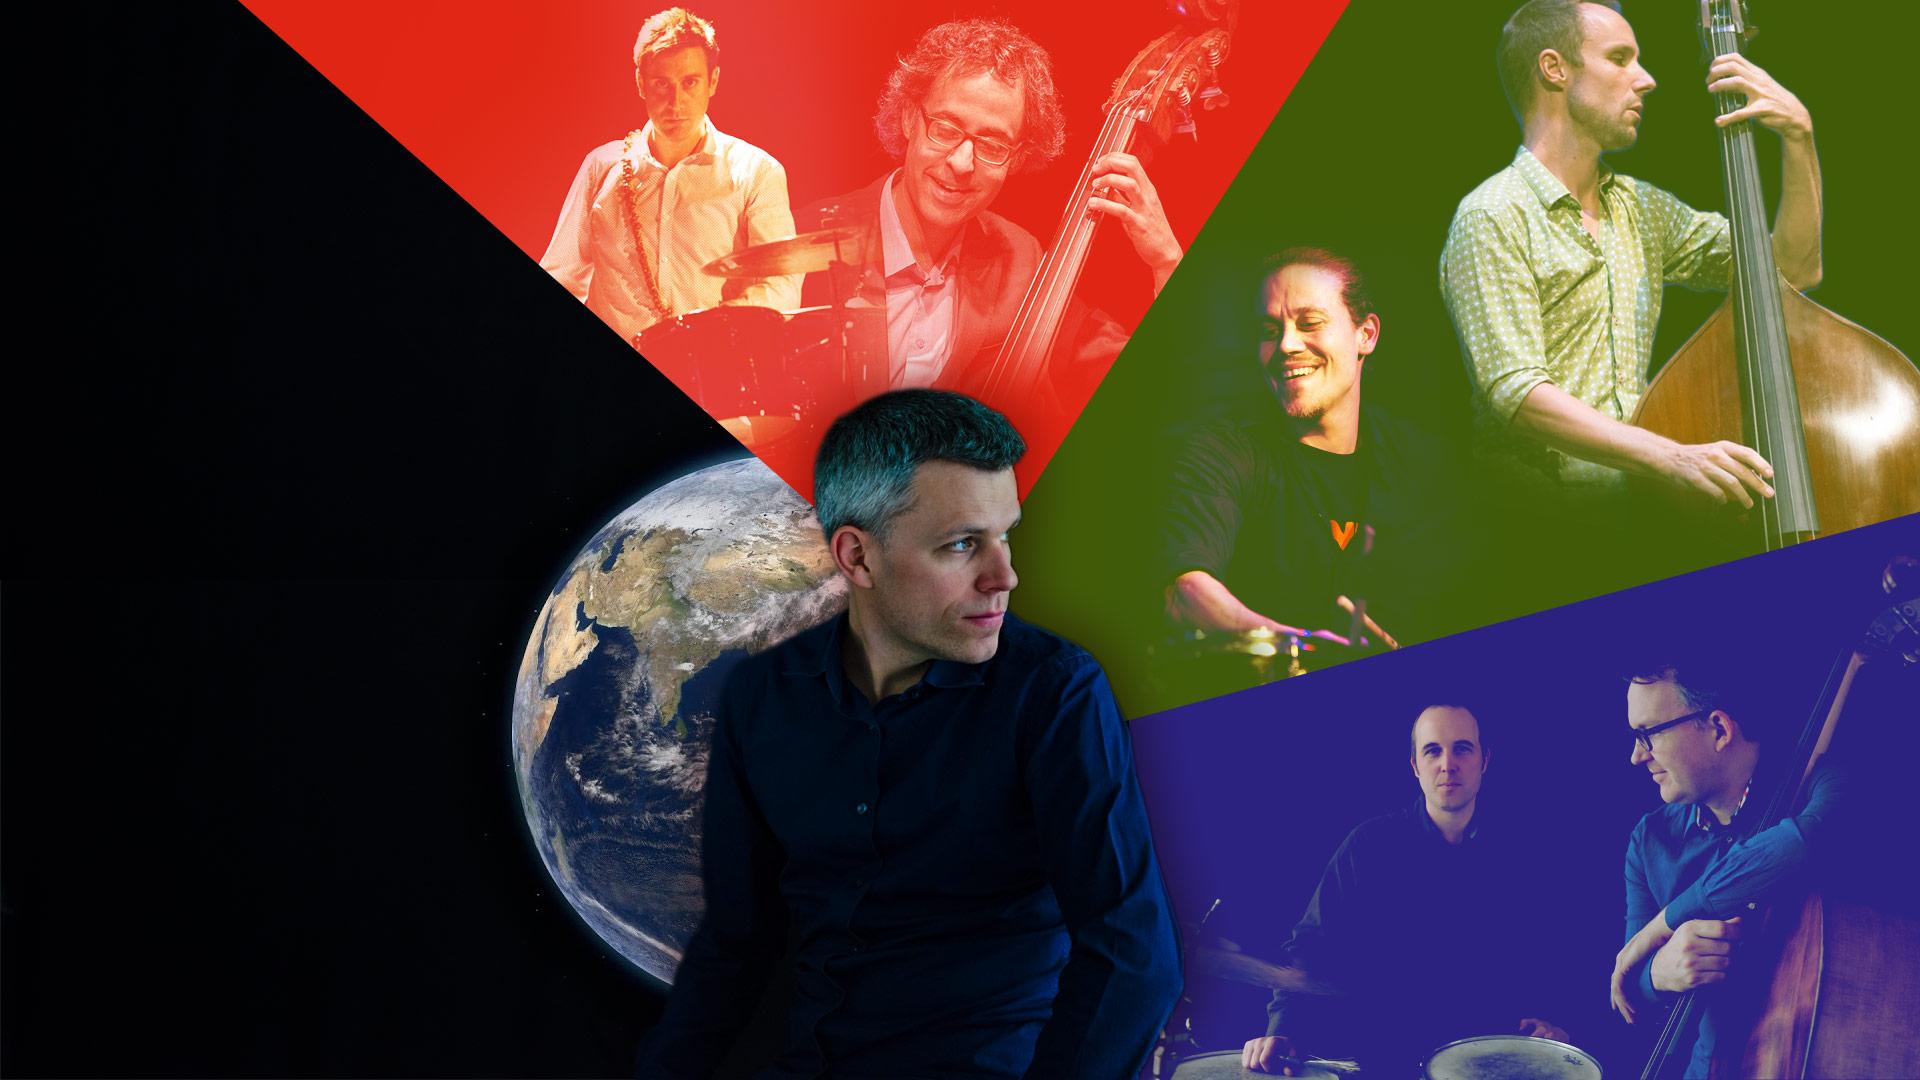 Florian Hoefner - 3 Trios Across The Globe